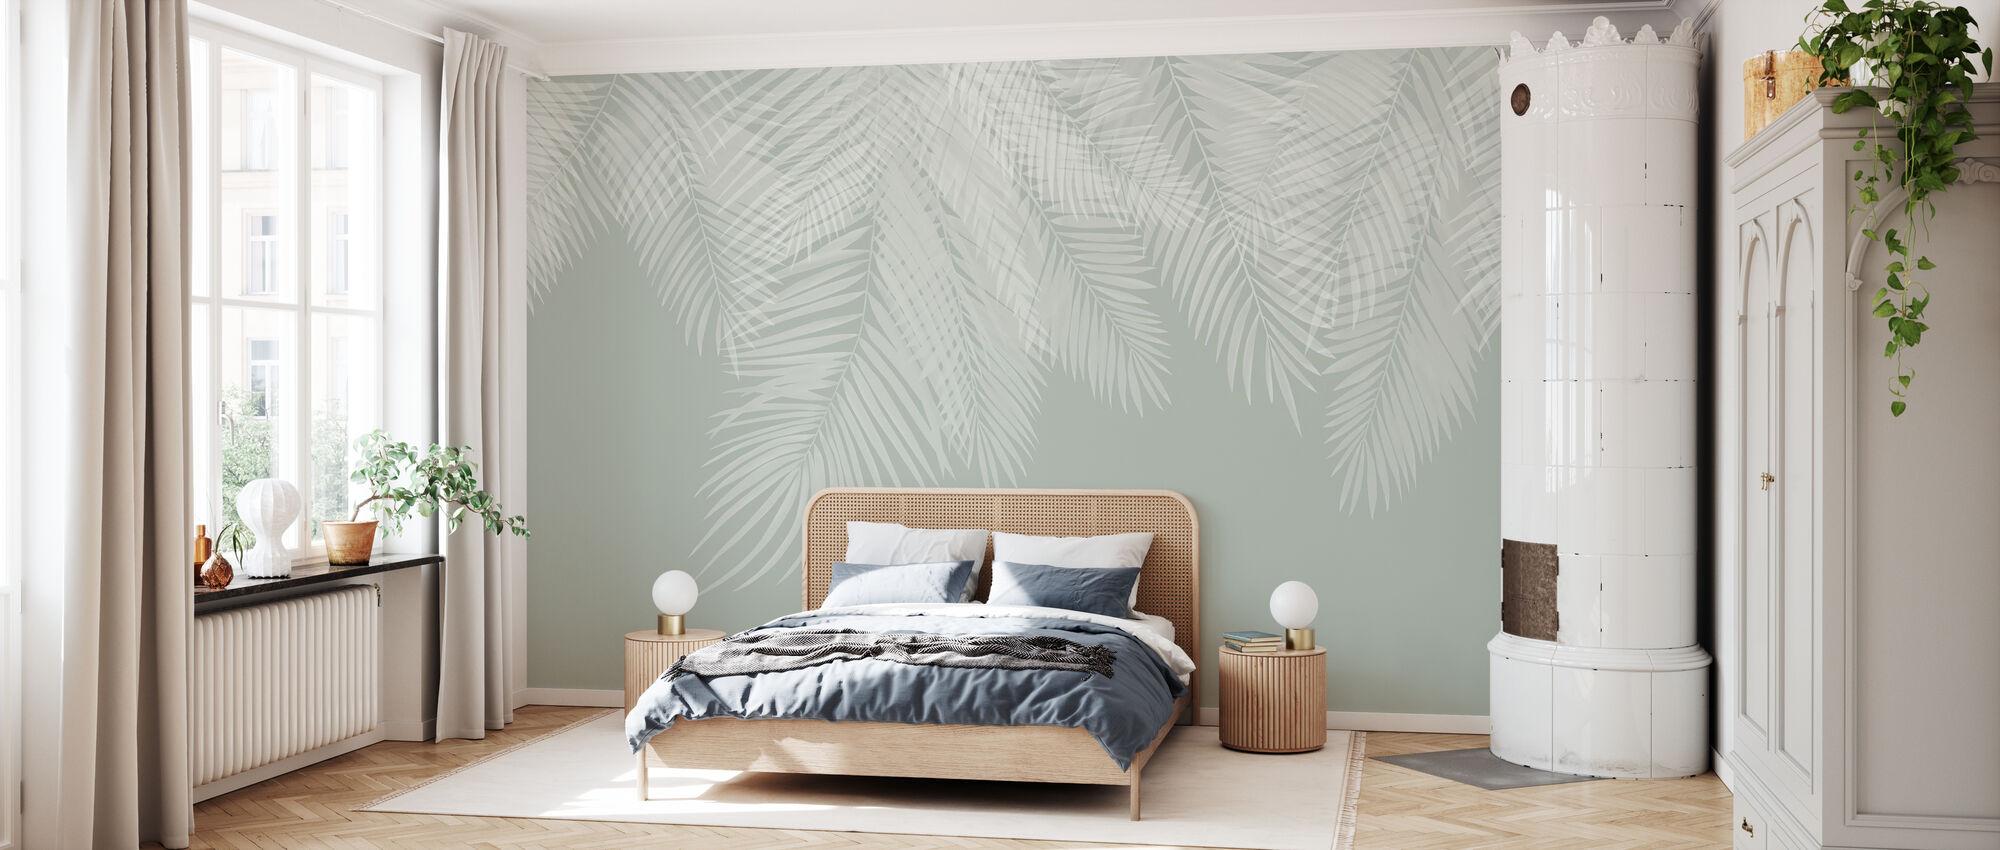 Foglie di palma da appendere - verde-bianco - Carta da parati - Camera da letto